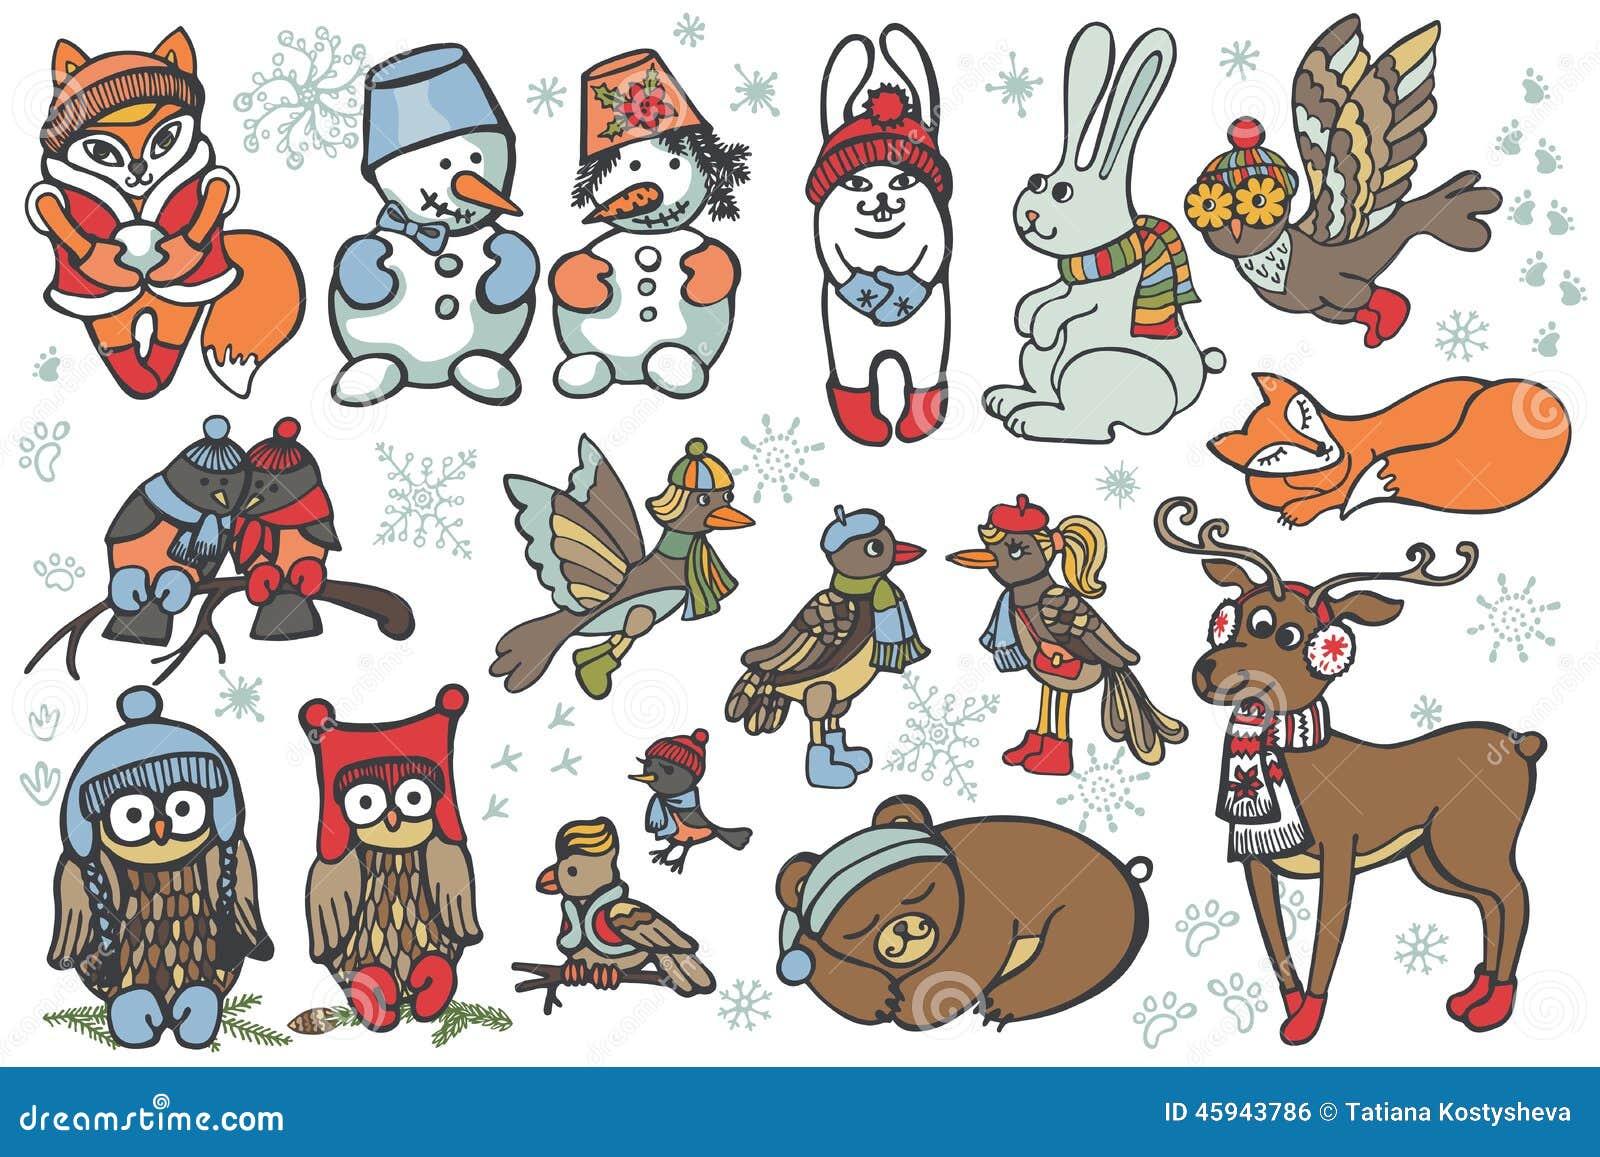 Winter Cartoons and Comics - CartoonStock - Cartoon Humor ...